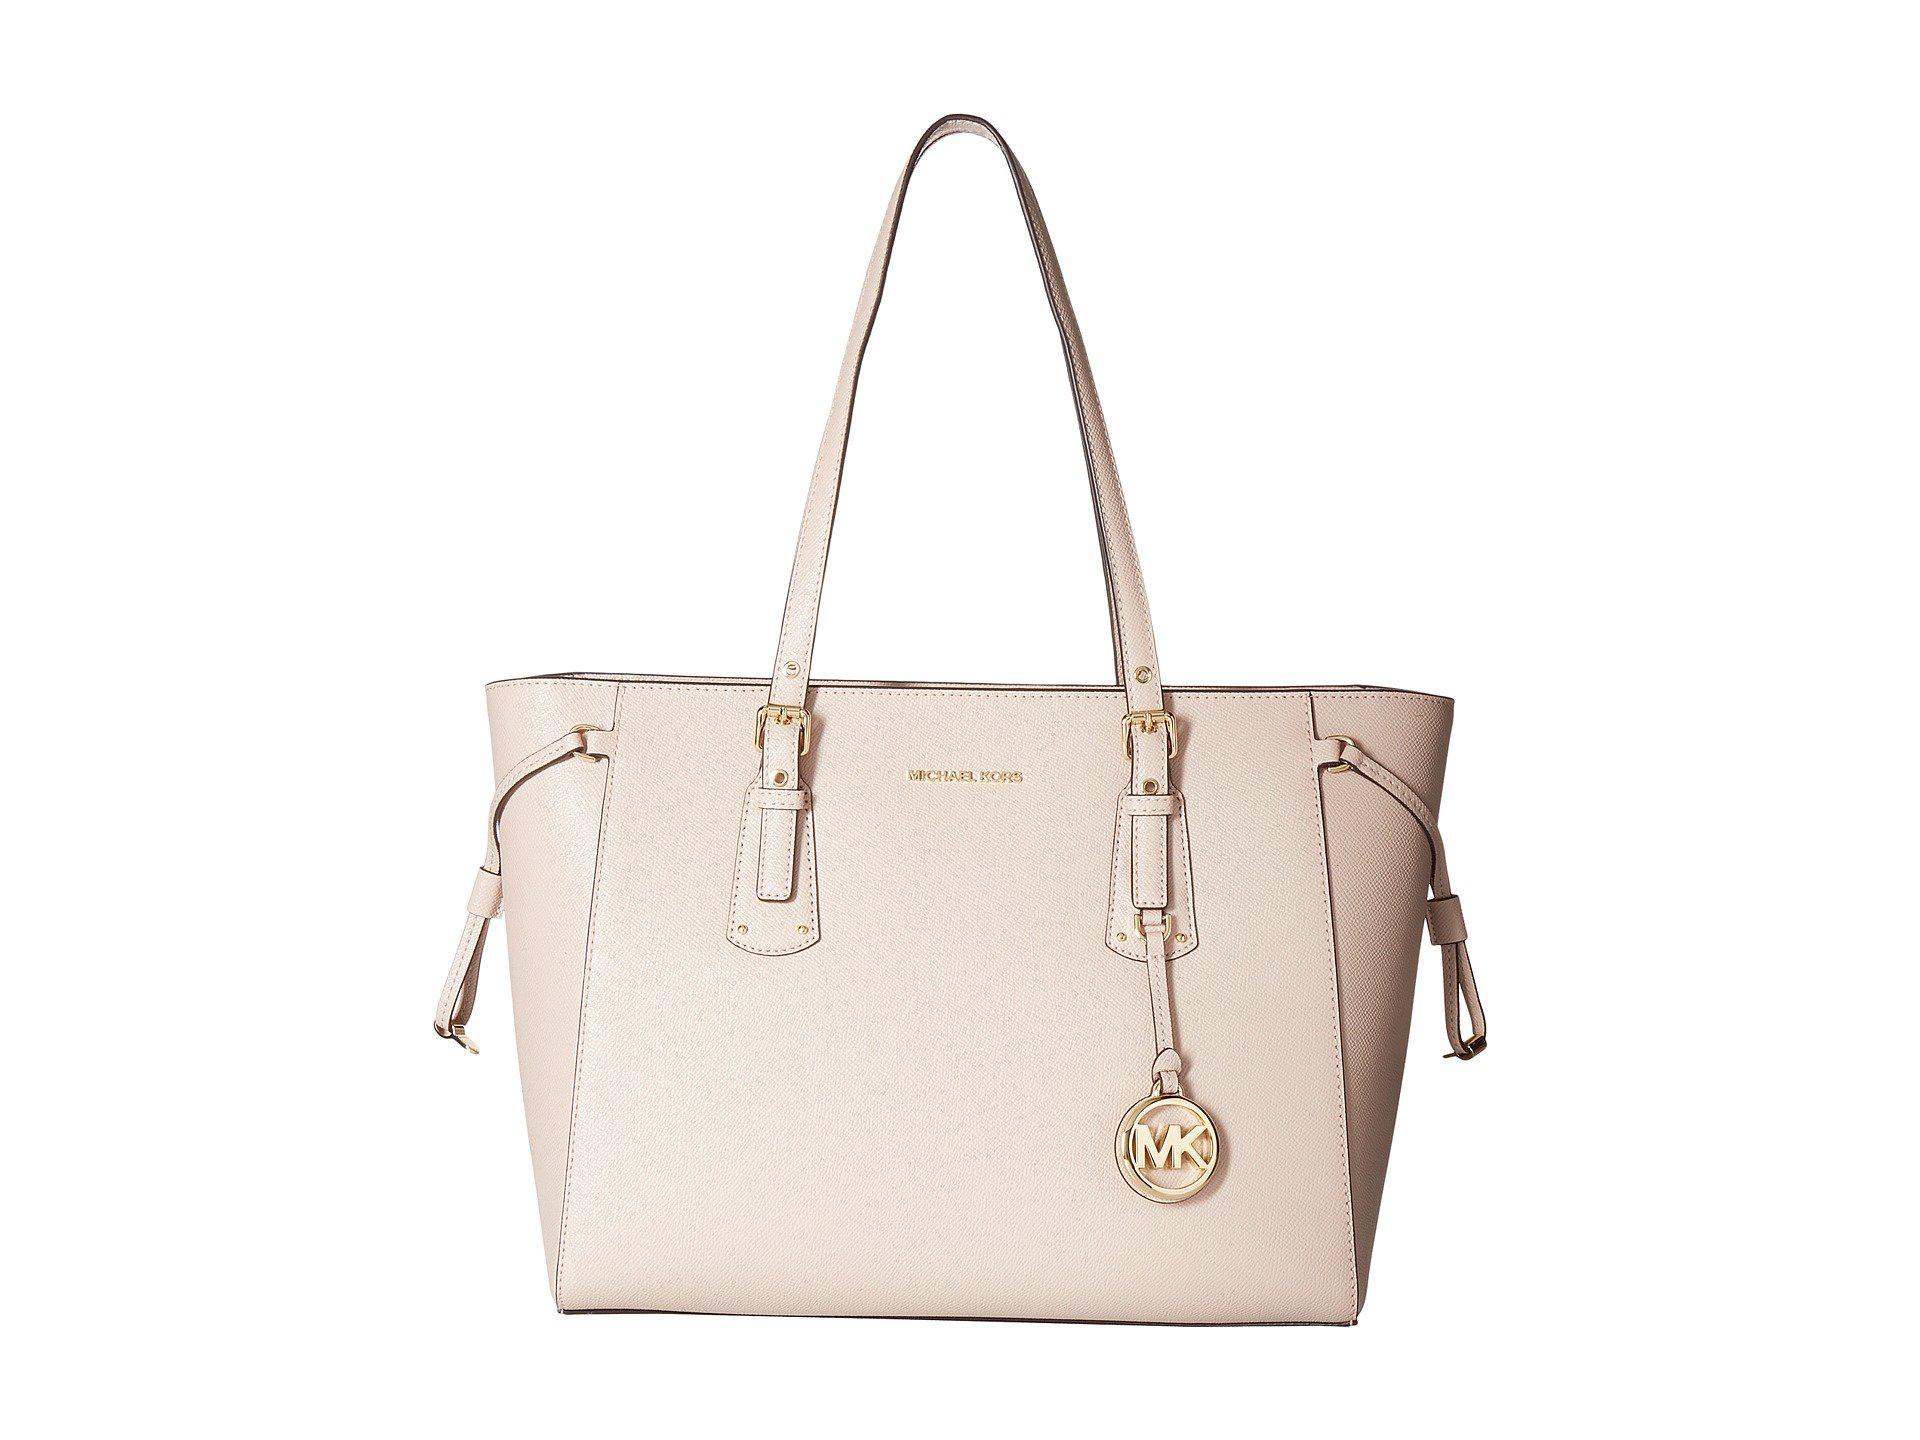 8c4edbb80124 Lyst - MICHAEL Michael Kors Voyager Medium Tote Bag in Pink - Save 29%